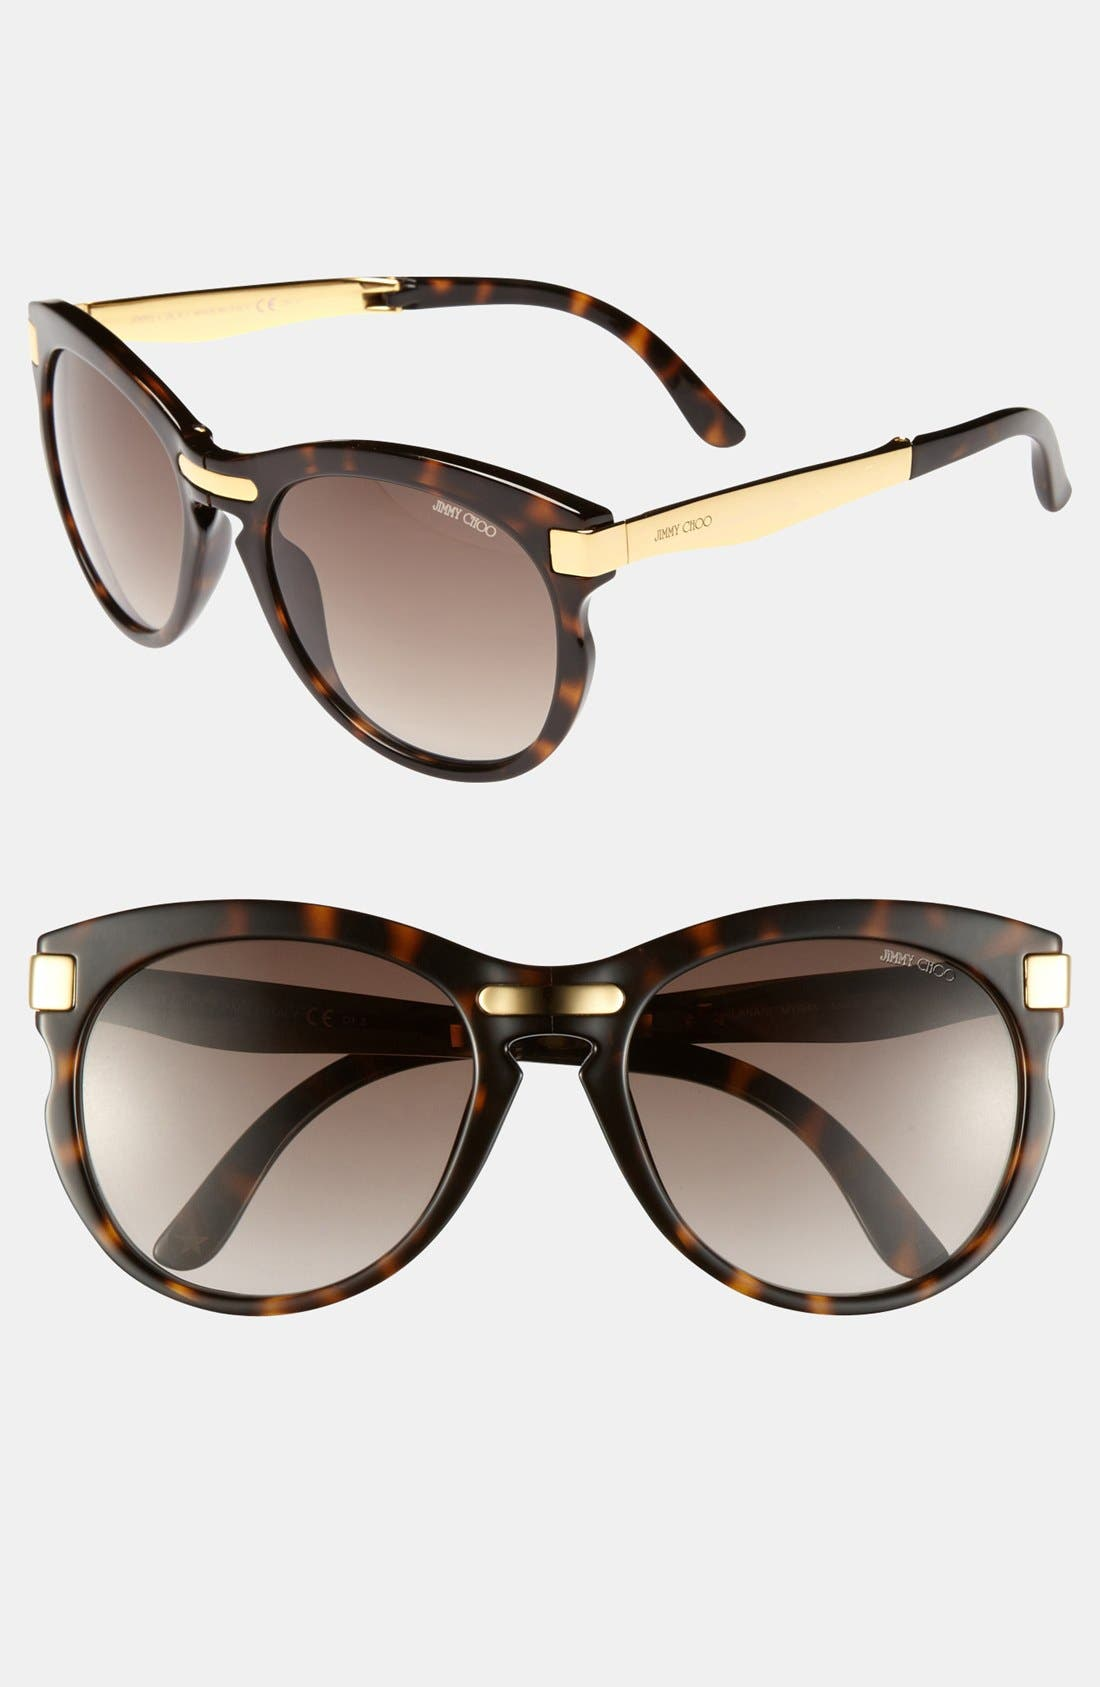 Alternate Image 1 Selected - Jimmy Choo 'Lanas' 55mm Sunglasses